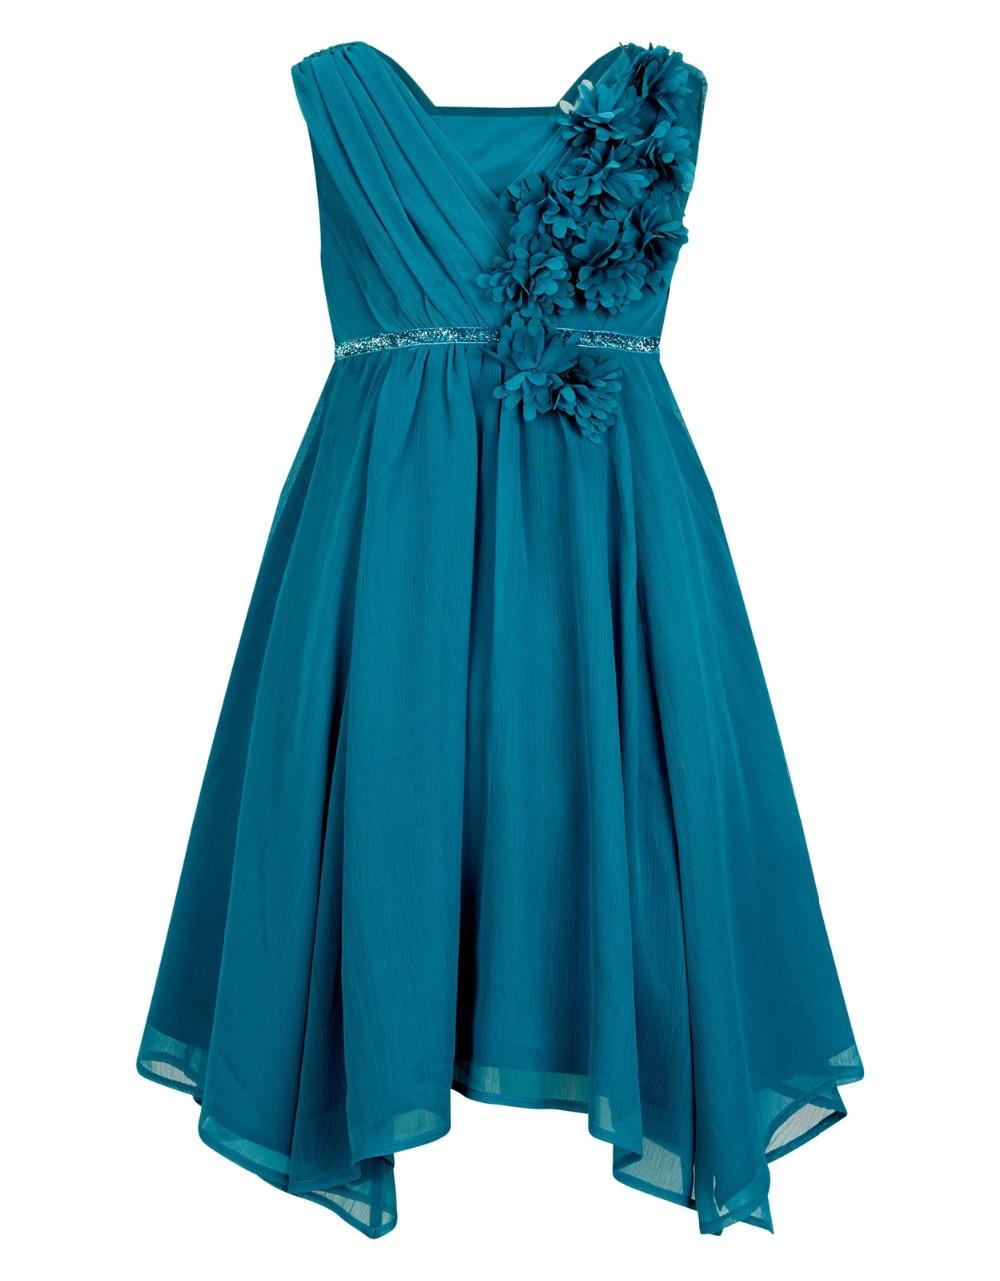 Здесь можно купить  Elegant Vestidos Pageant Royal Blue Draped Appliques Chiffon Communion Dress Baptism Gowns For Little Girls With Sequined Sash  Детские товары